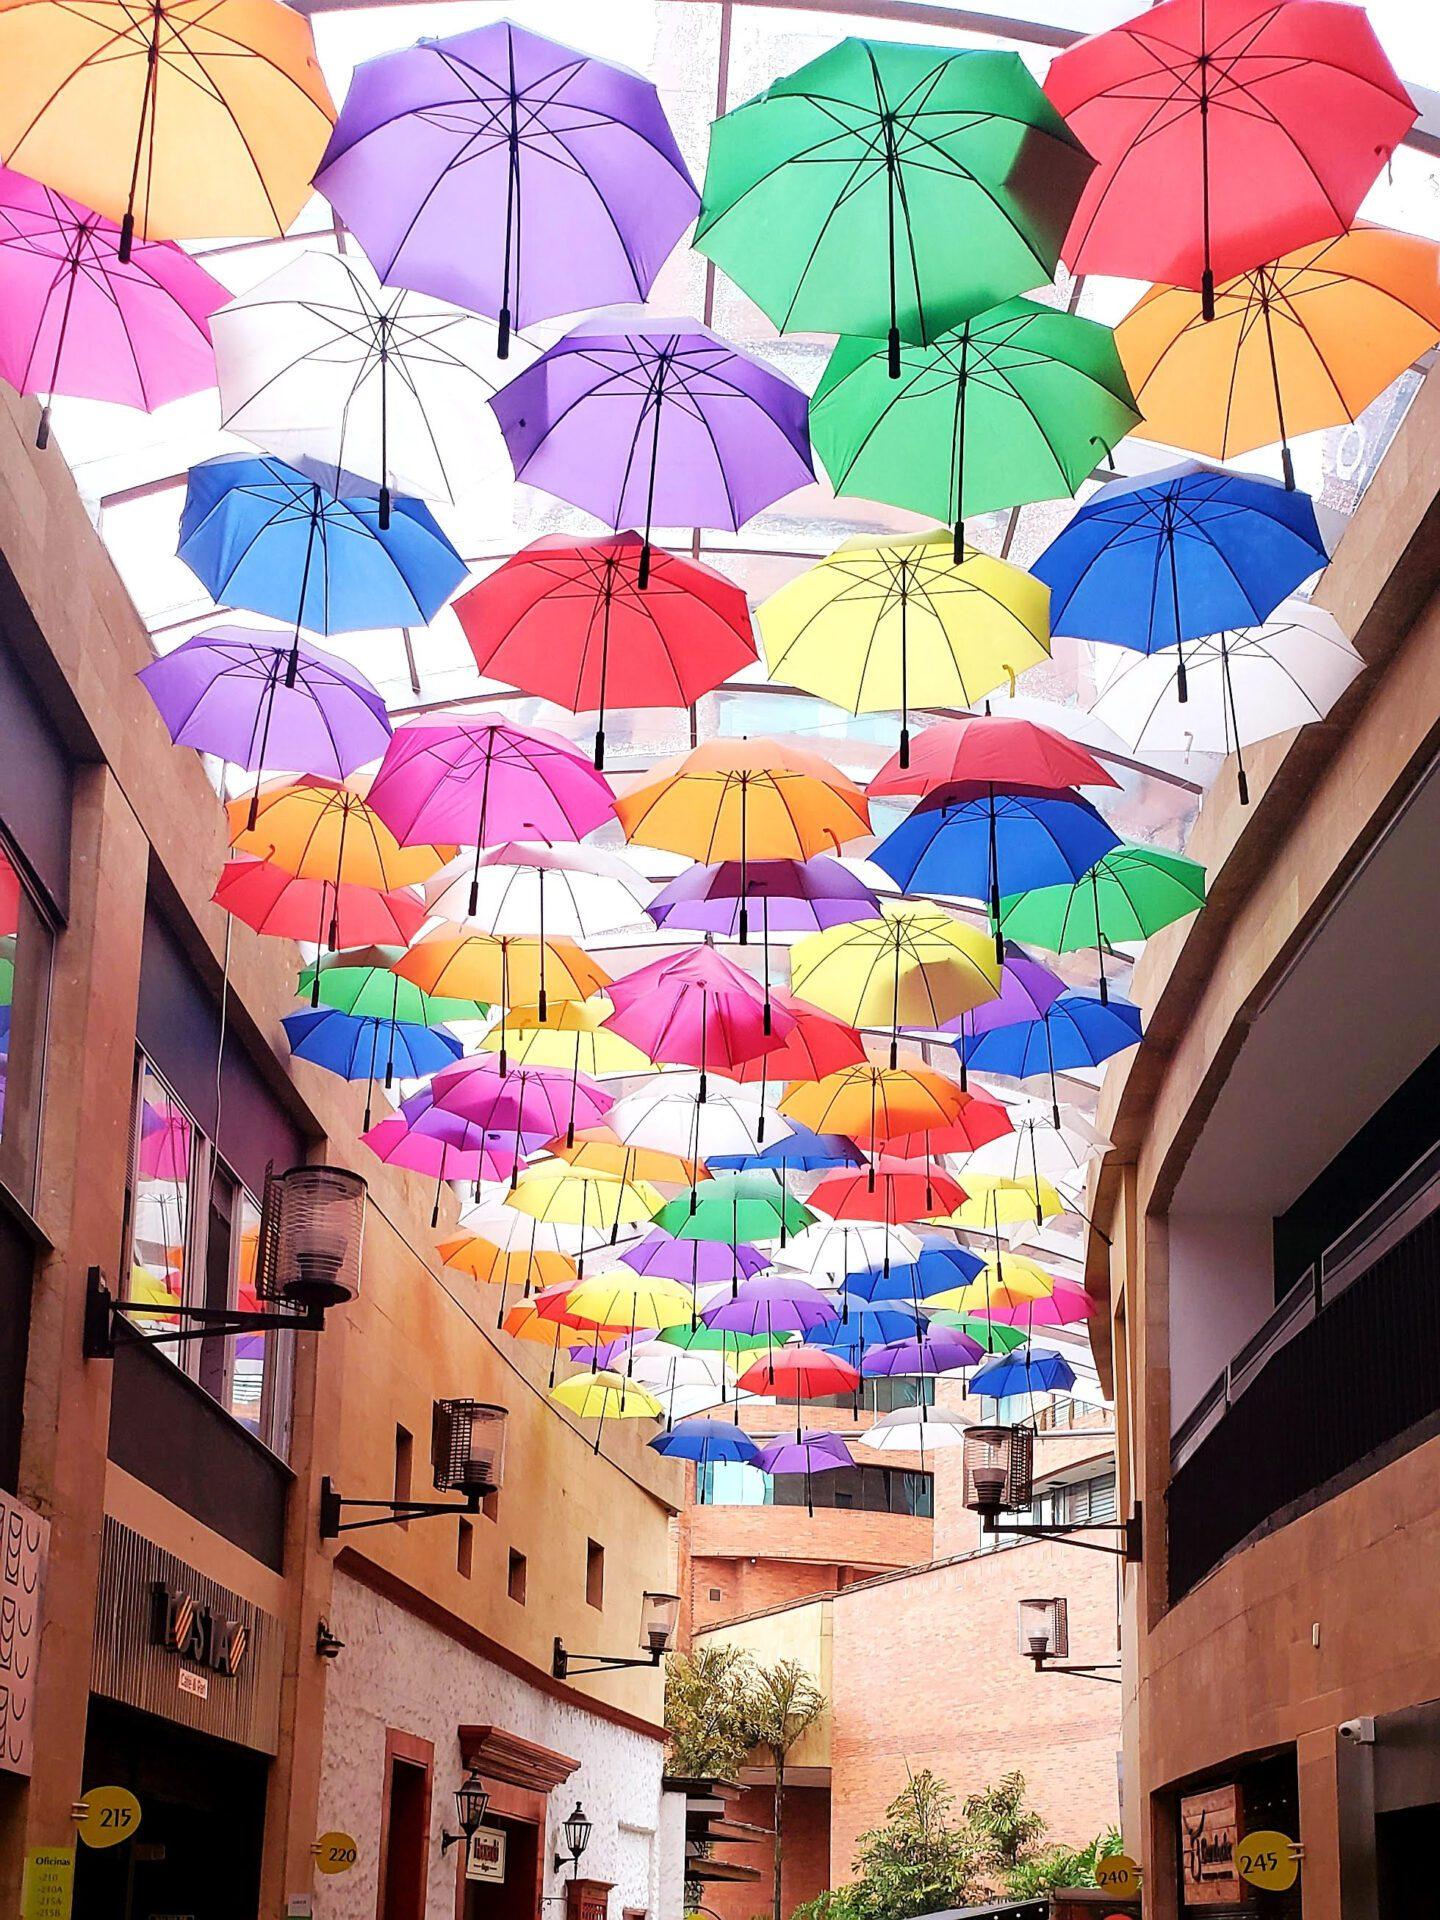 medellin-coloured-umbrellas